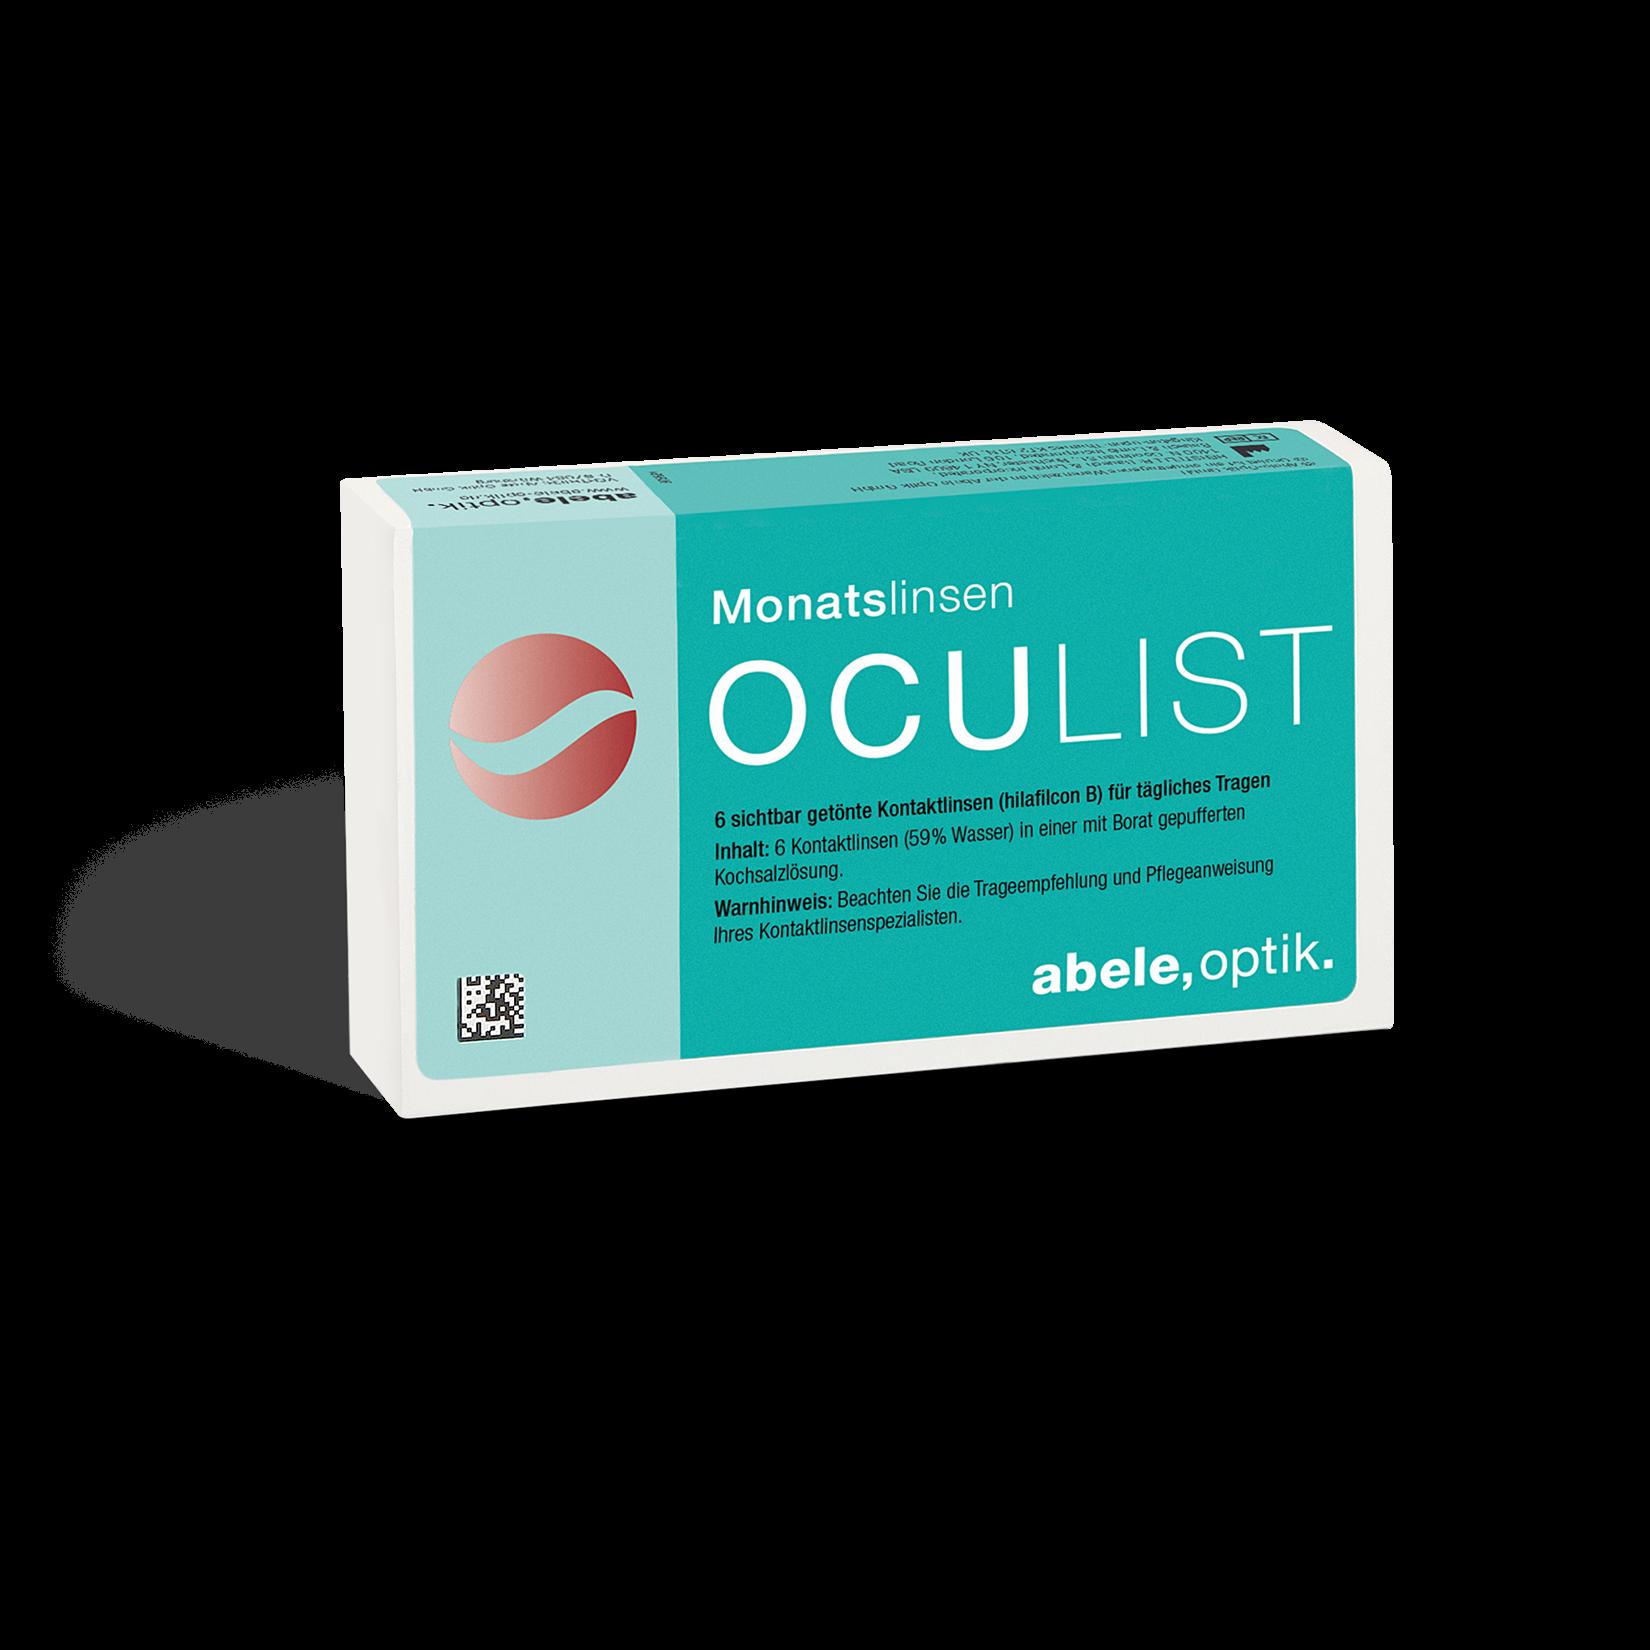 Oculist, Abele Optik (6 Stk.)